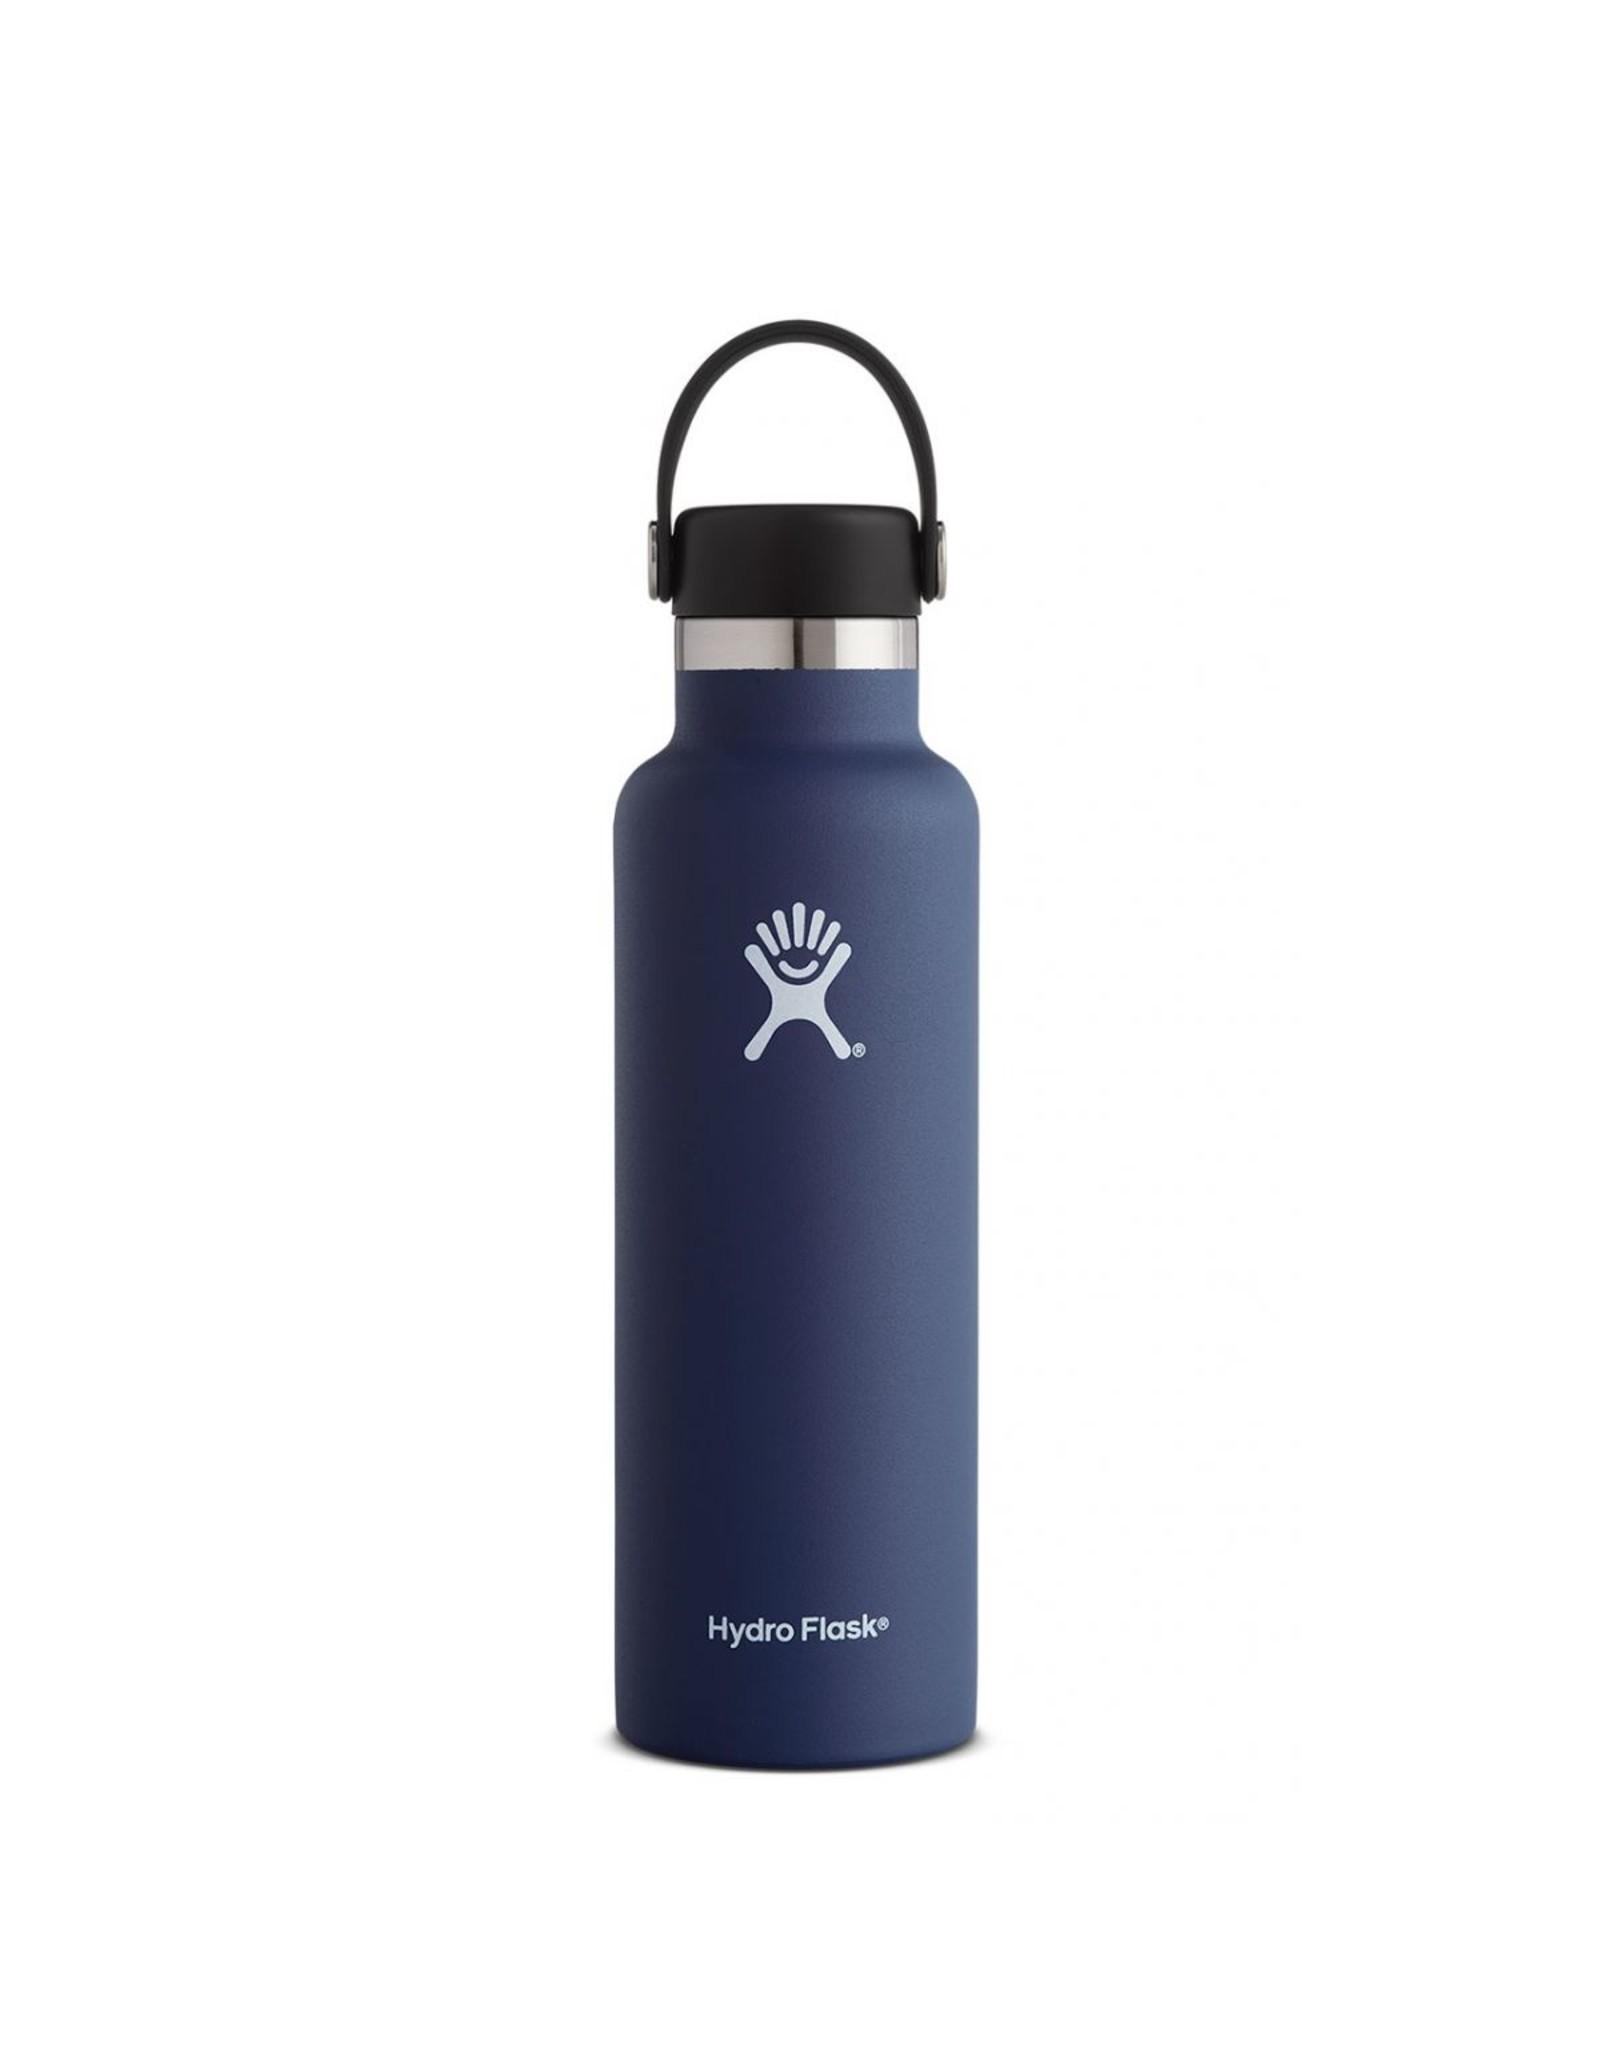 Hydro Flask Hydro Flask 21oz Standard Mouth with Flex Cap Cobalt